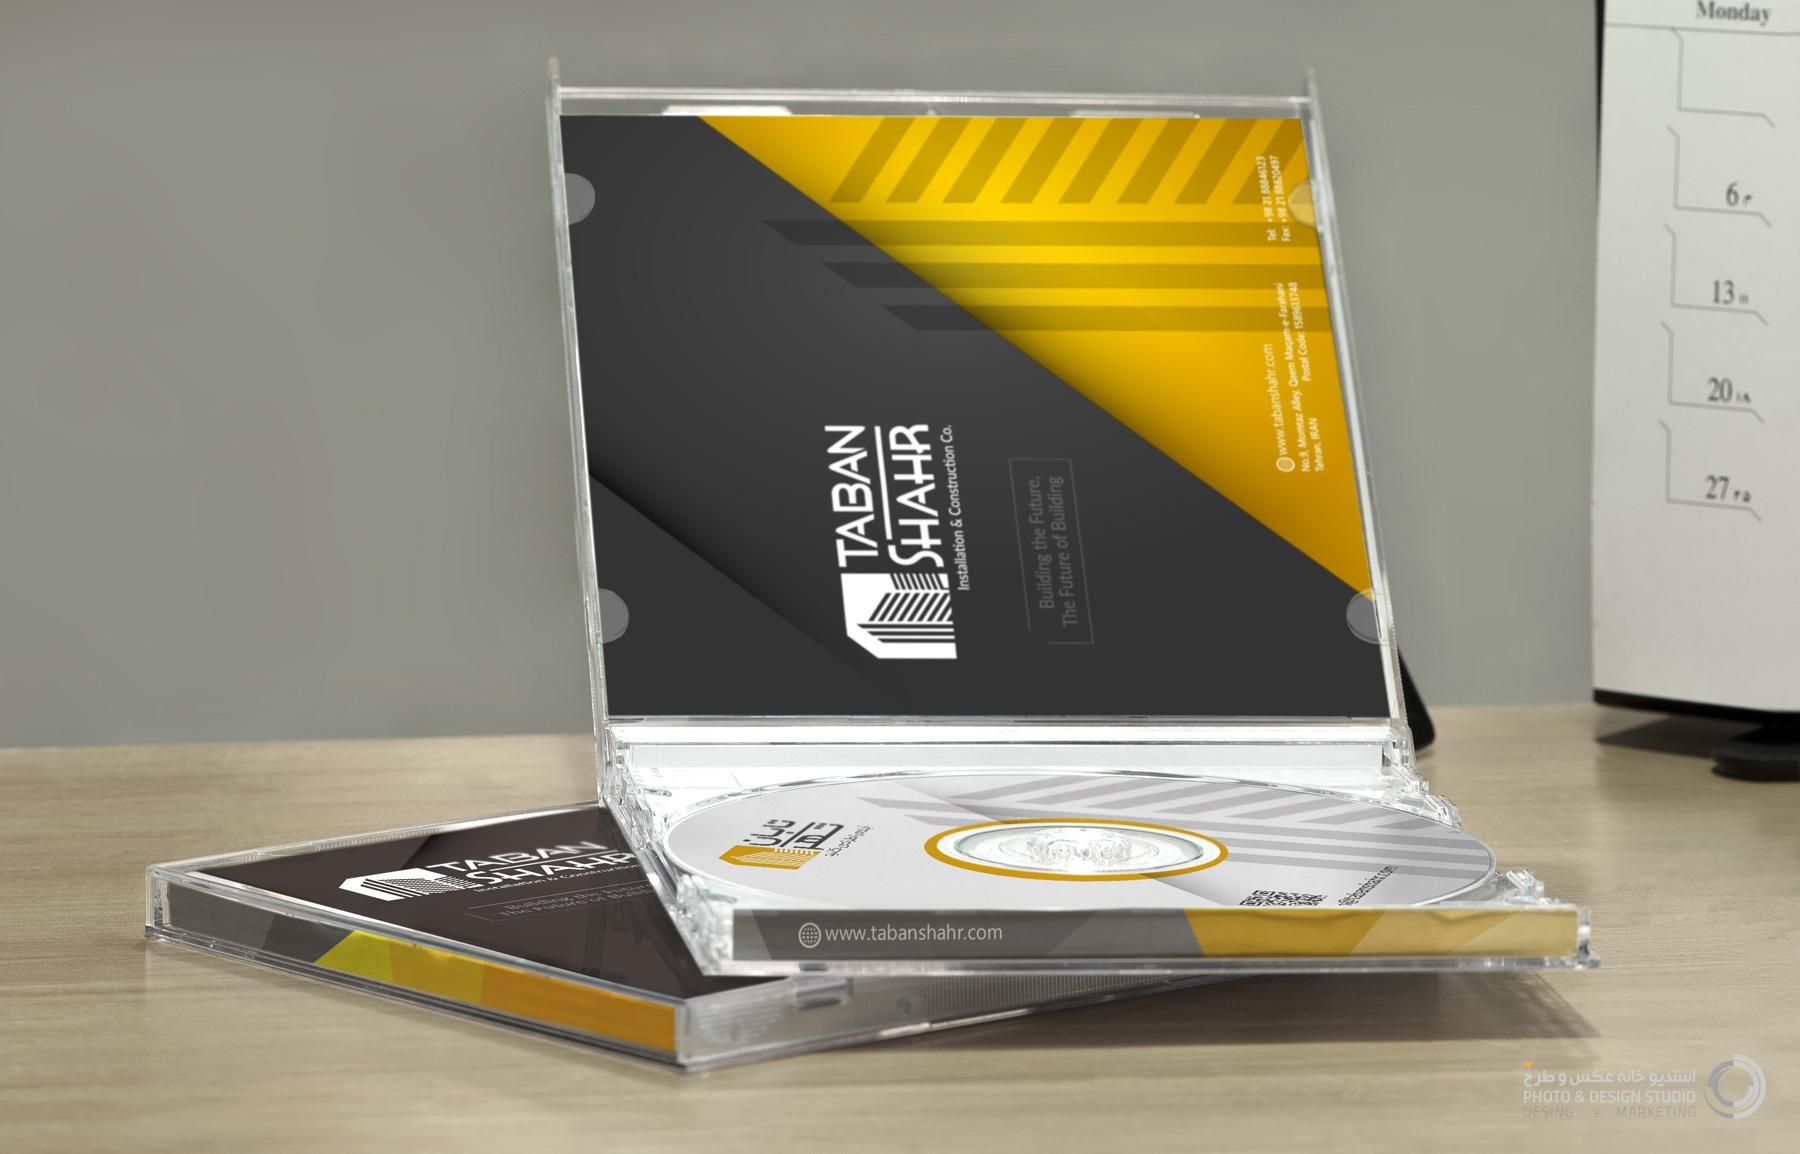 Office-set, design, identity, branding, office paper, unique, creative, idea, business, set